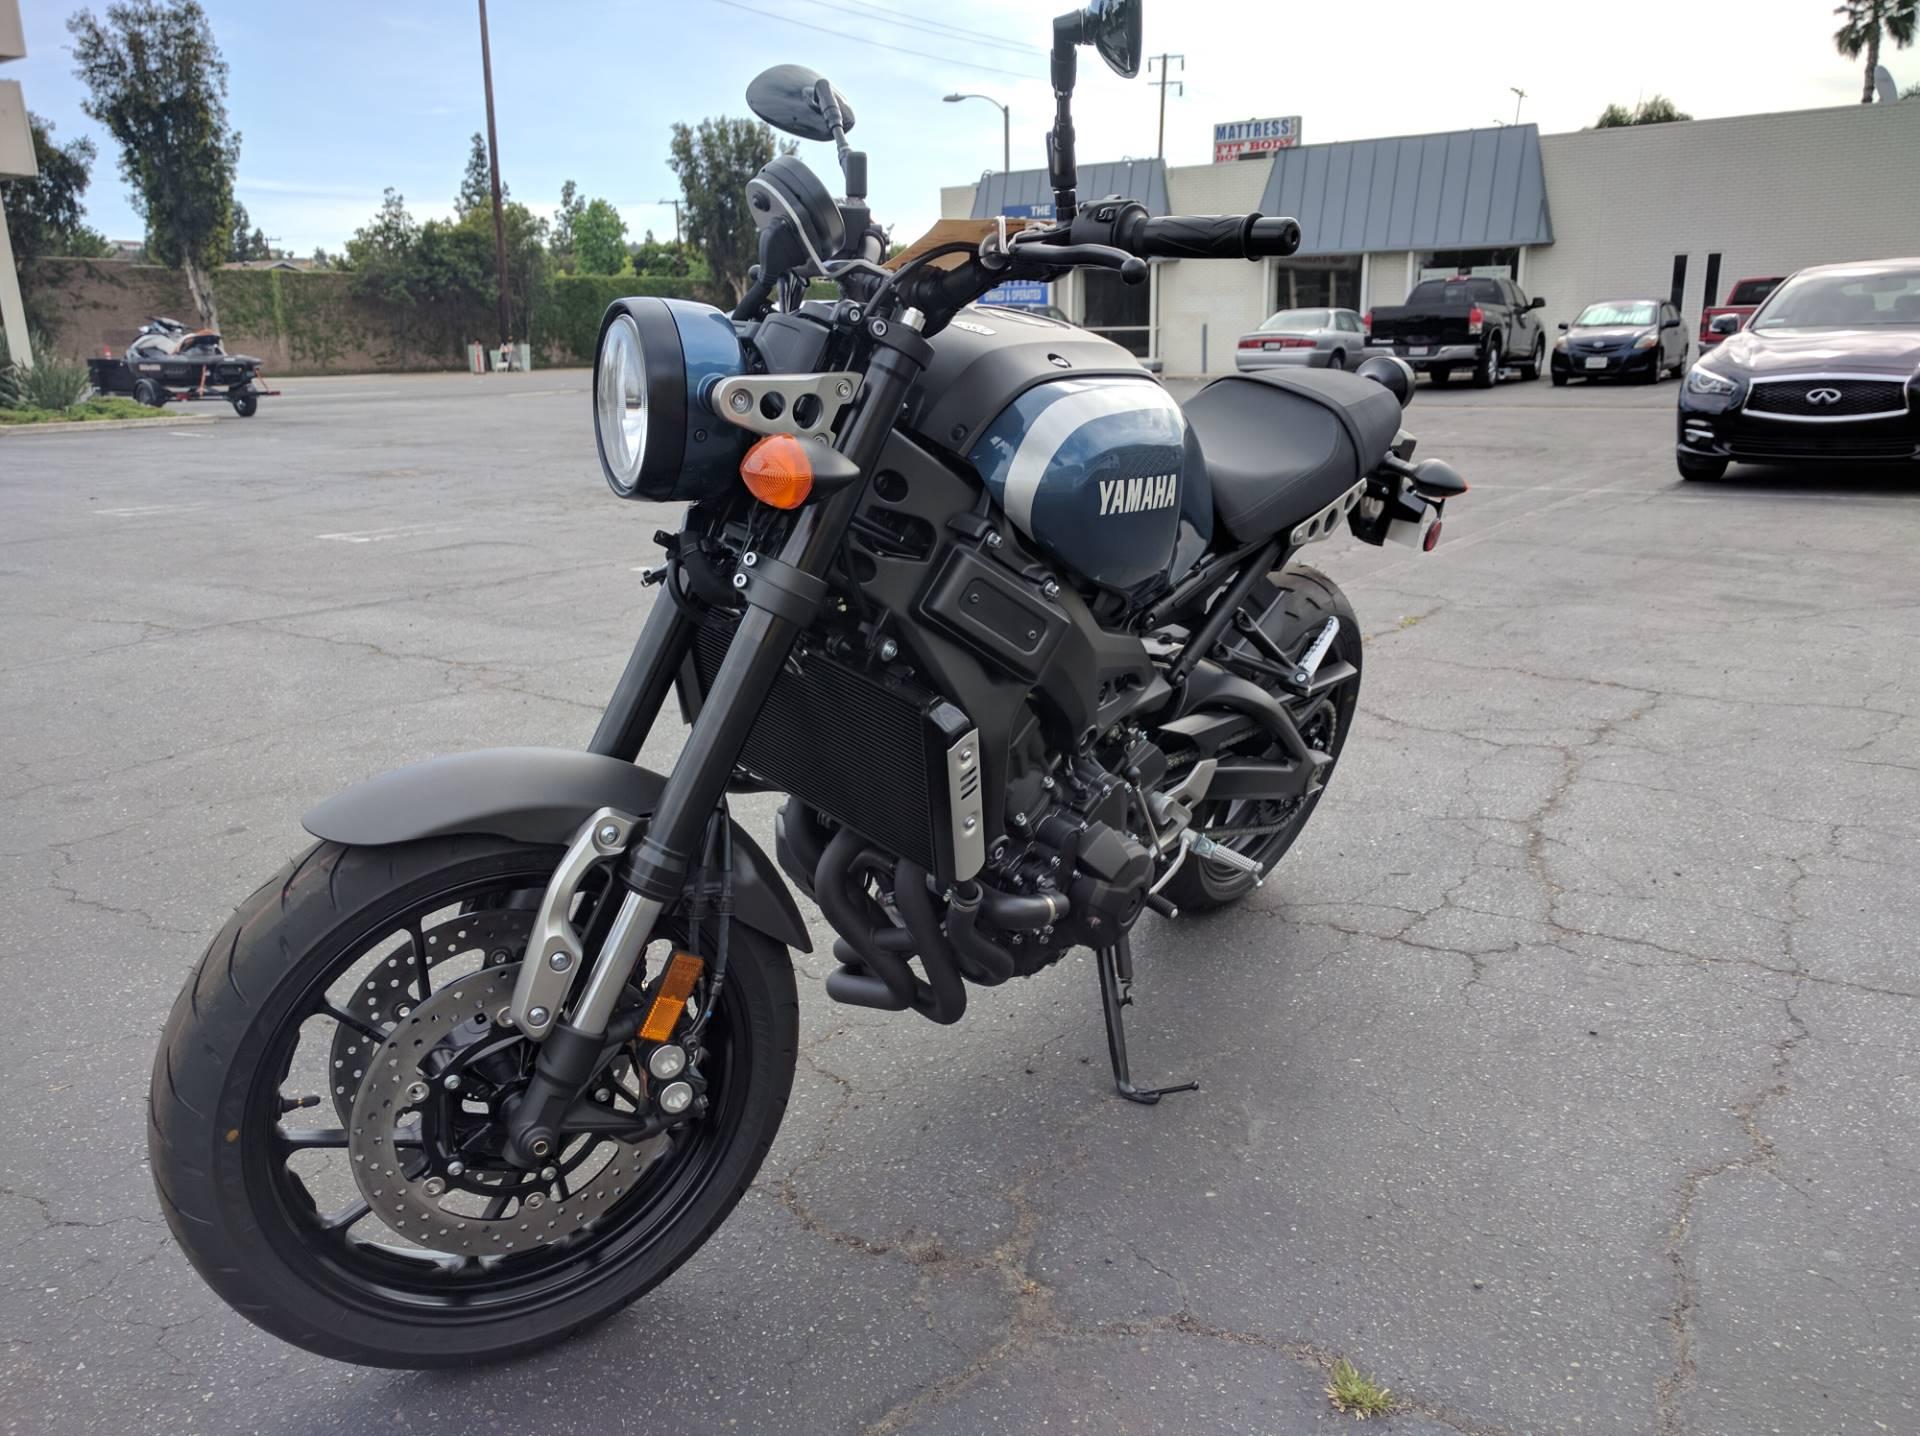 2017 Yamaha XSR900 5